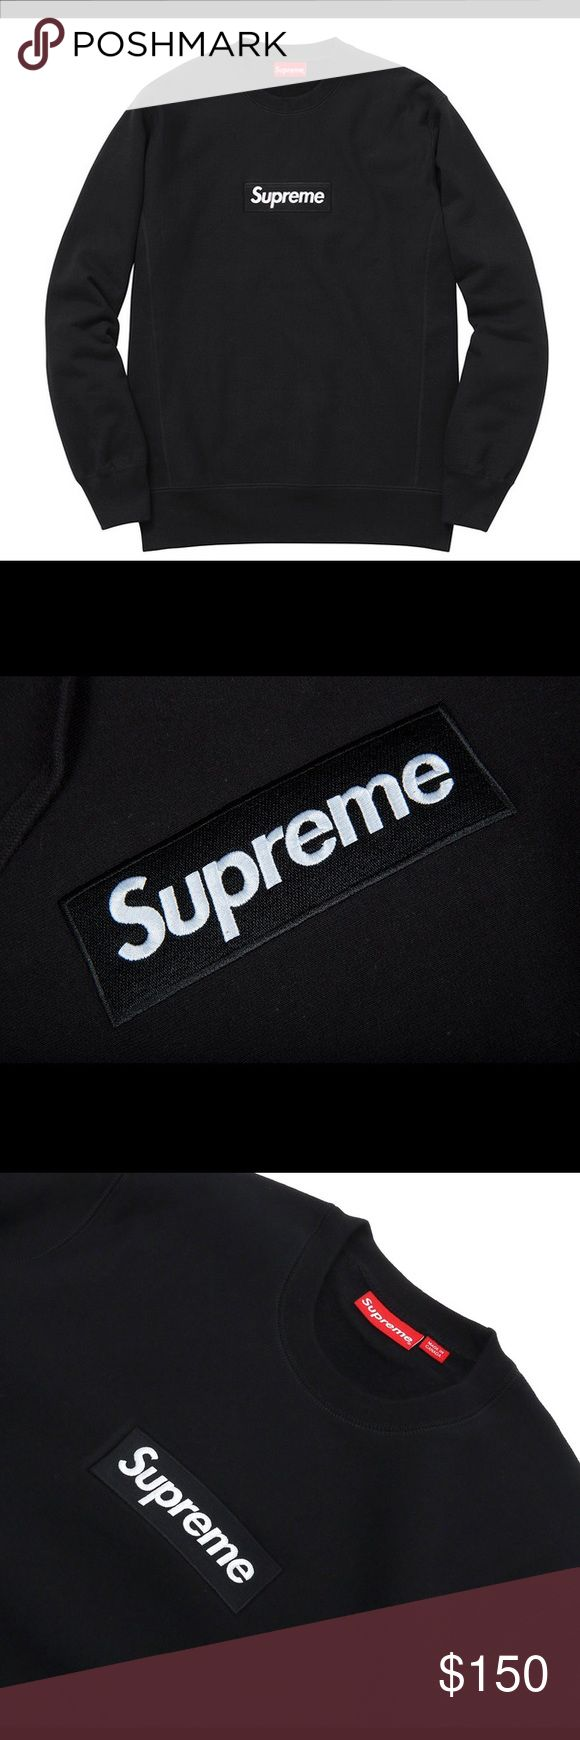 Black Supreme Box Logo Crewneck Size Medium. Perfect for upcoming winter. Supreme Sweaters Crewneck